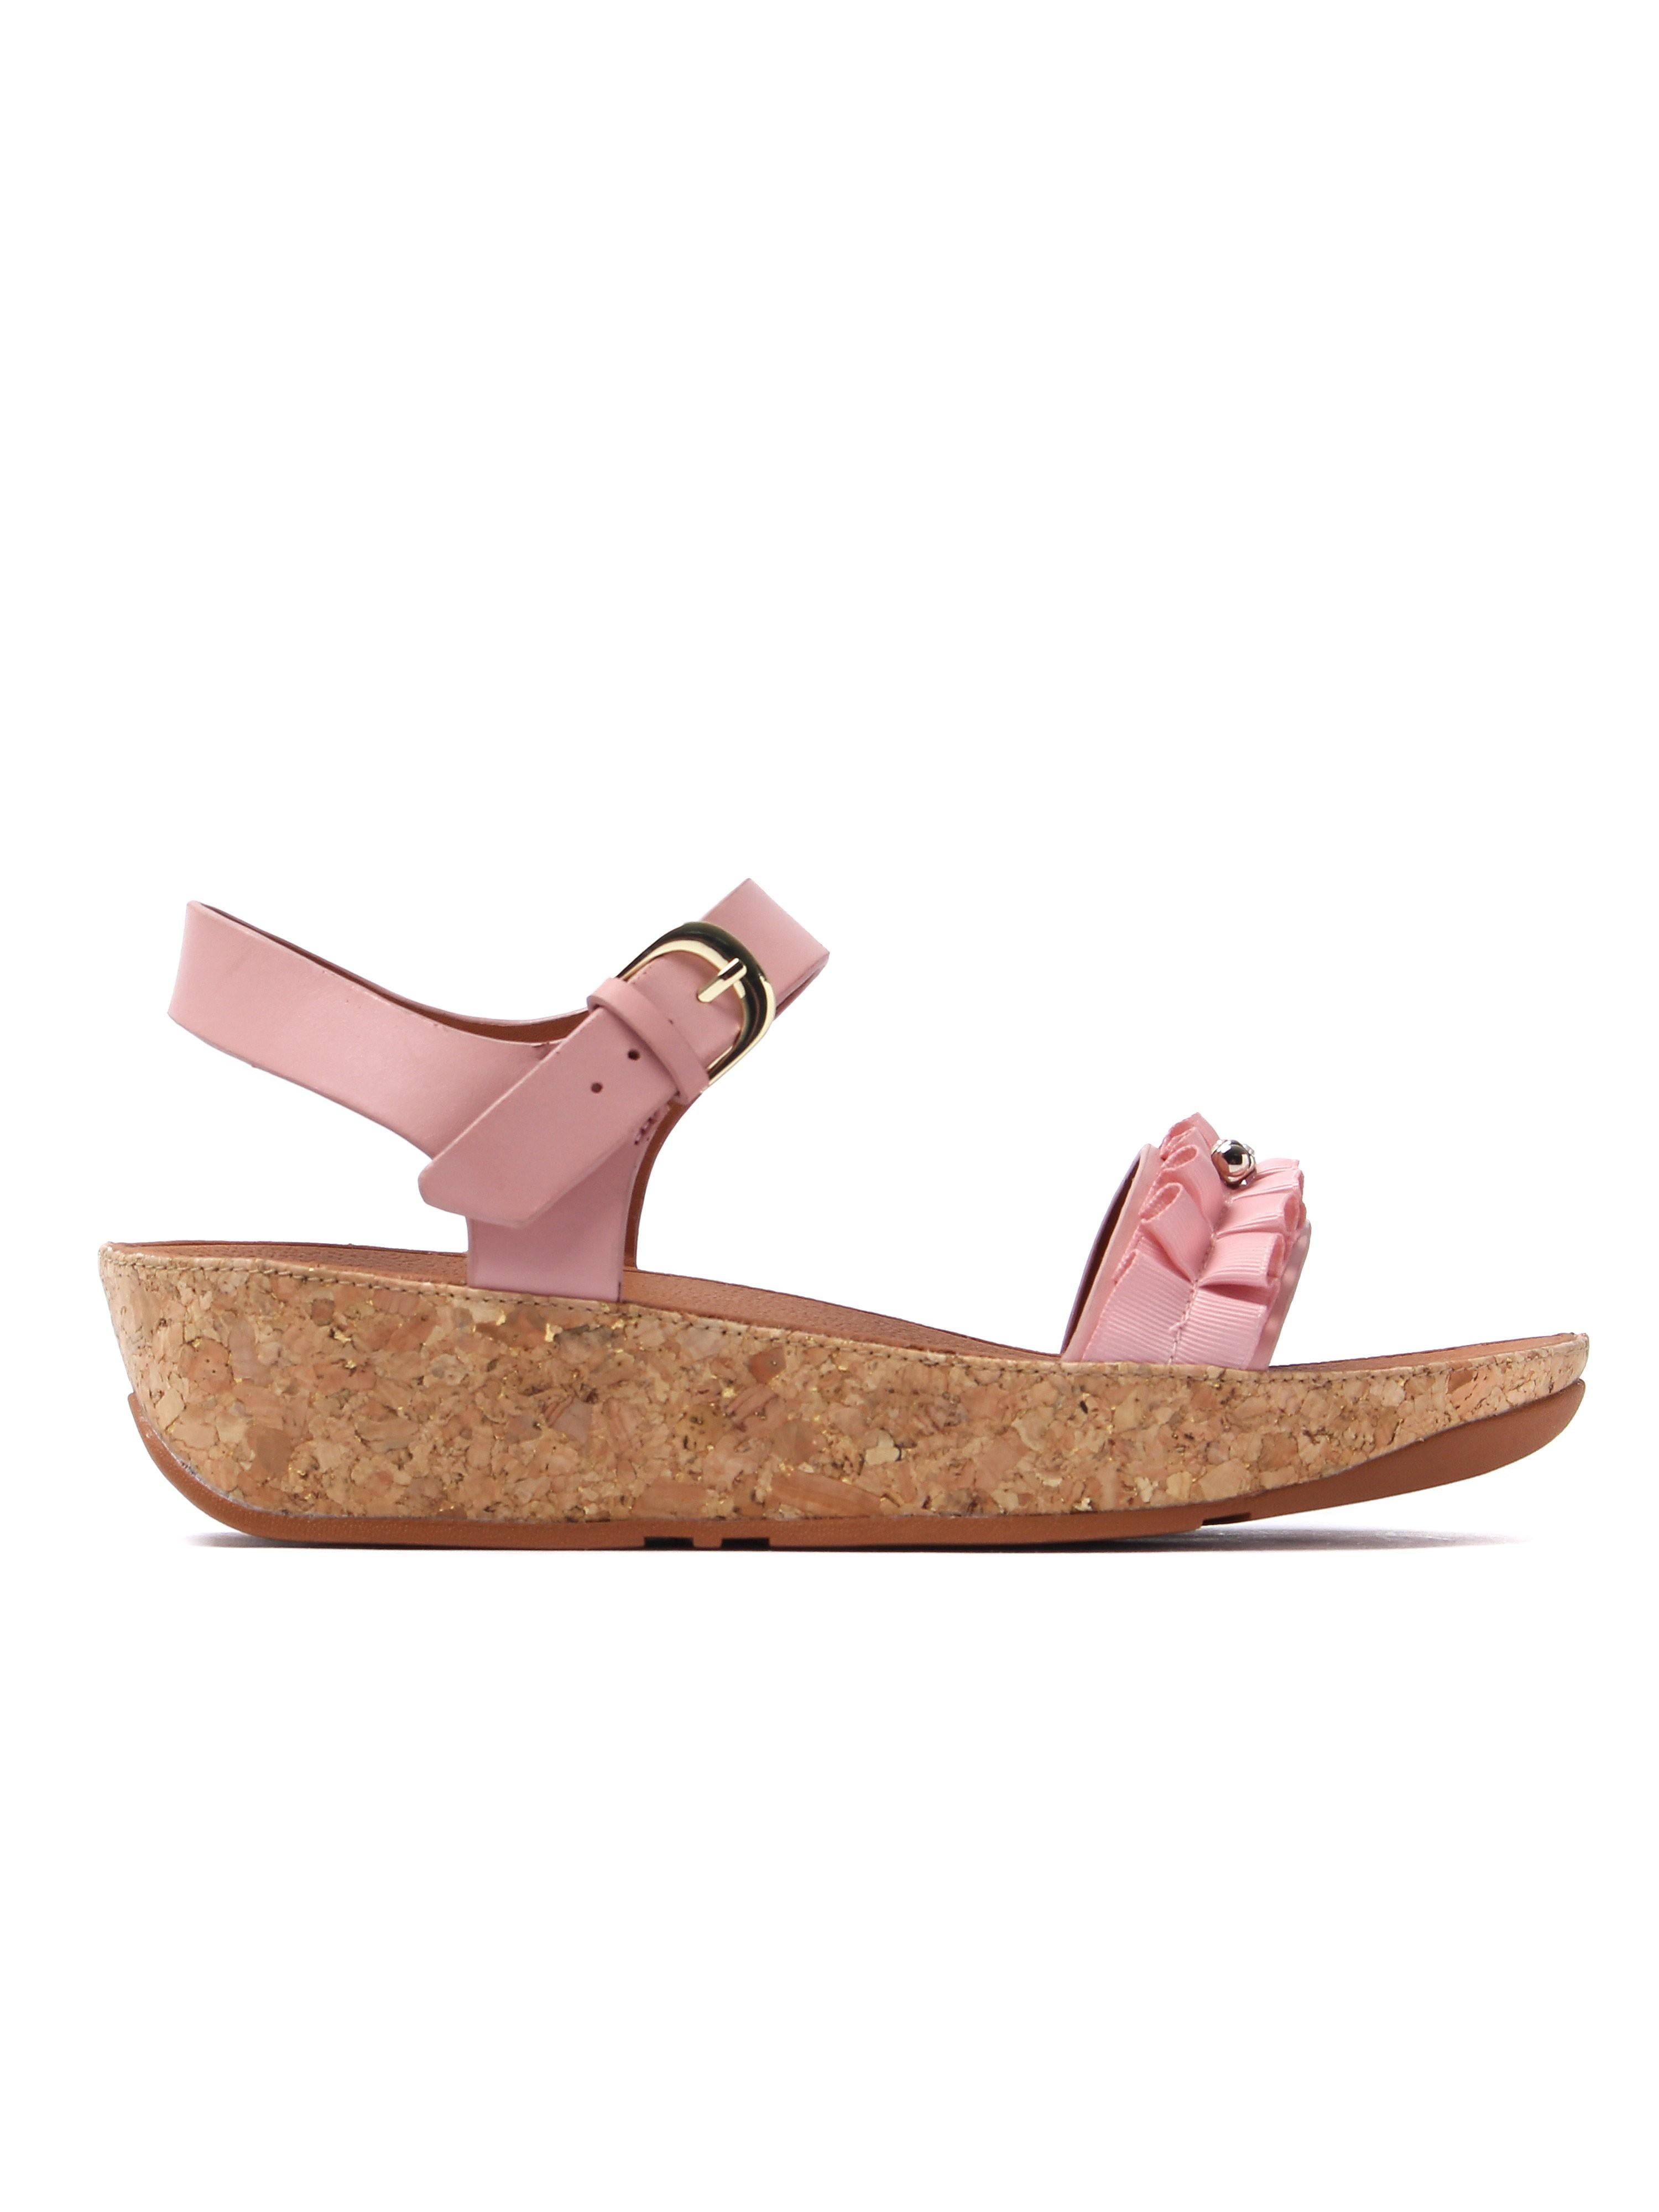 FitFlop Women's Ruffle Back-Strap Sandals - Dusky Pink